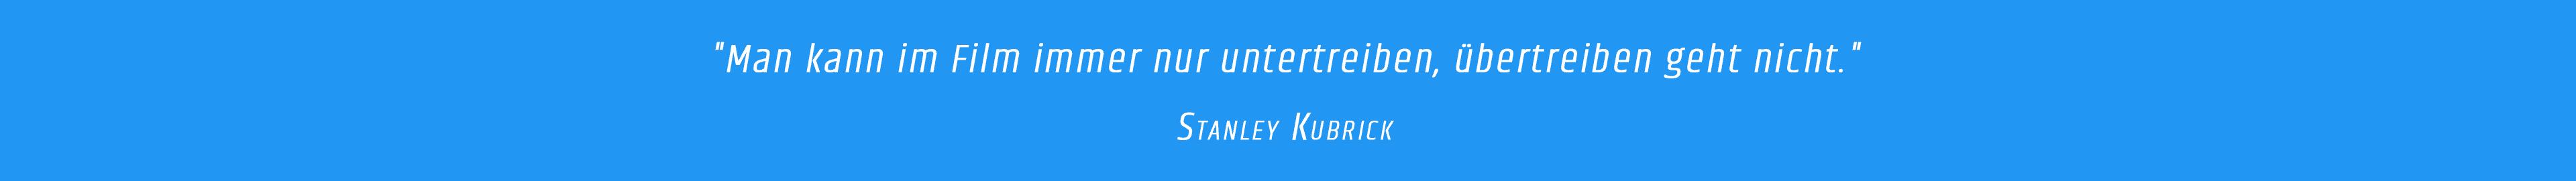 Zitat - Stanley Kubrick